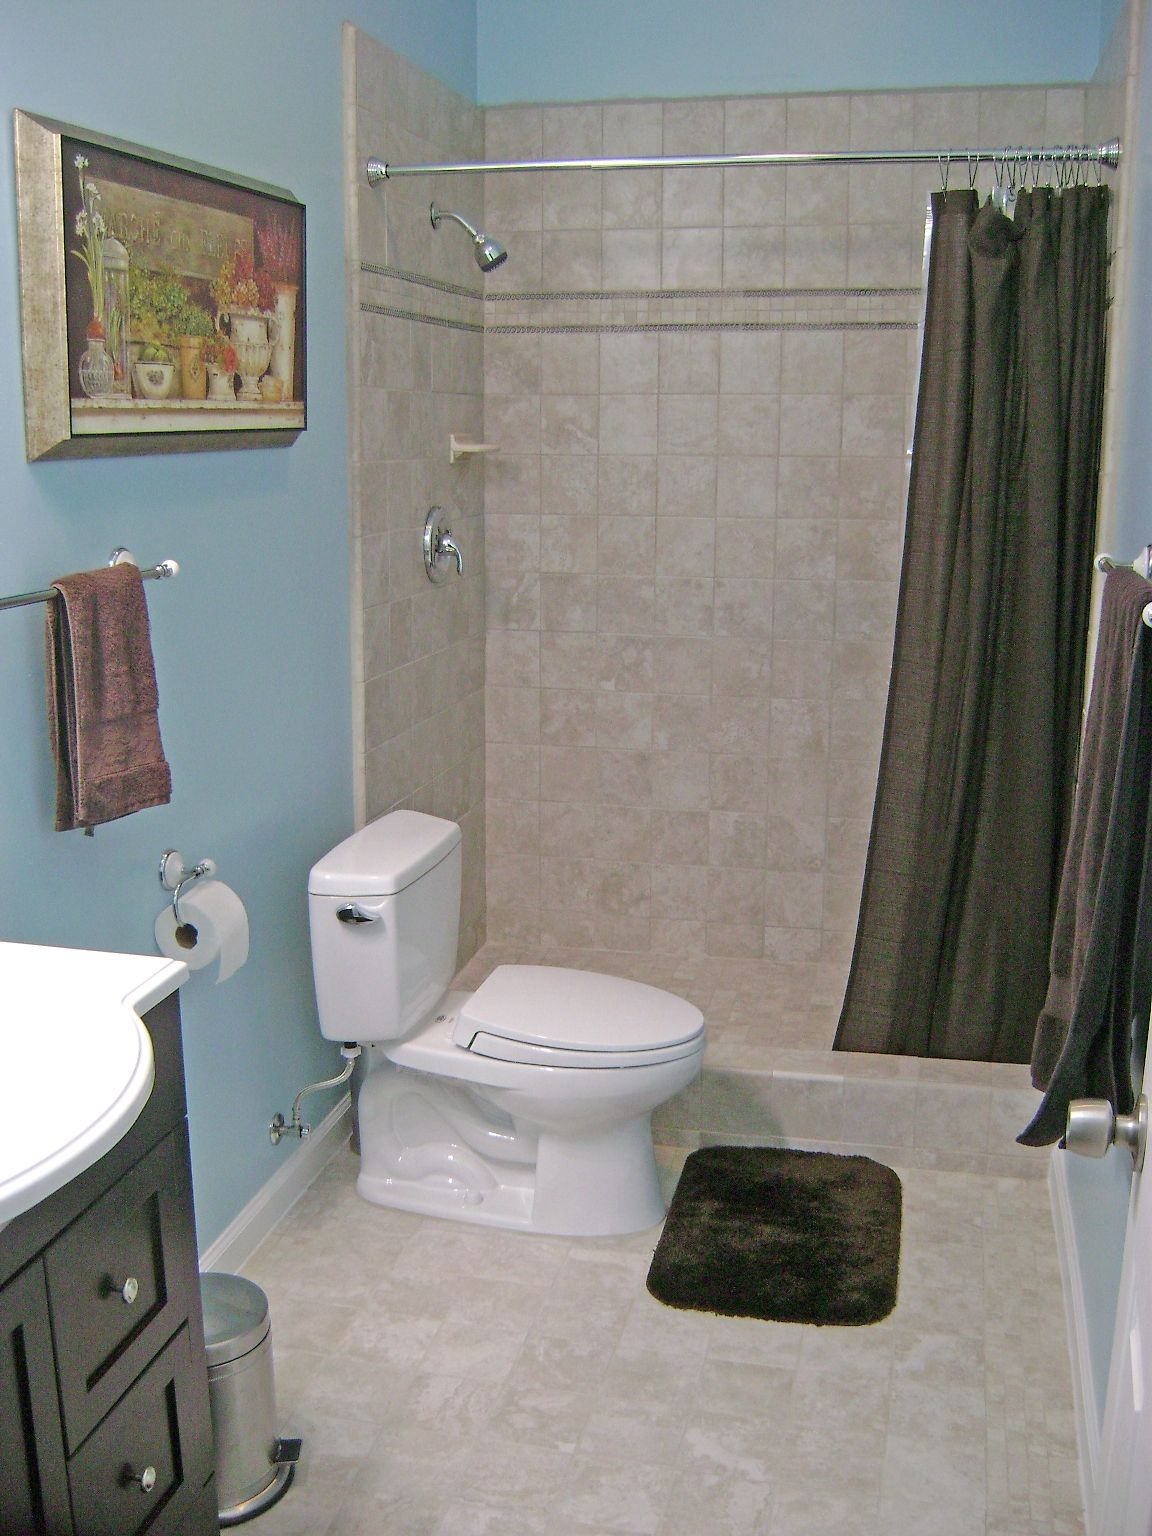 How To Finish A Basement Bathroom Basement Bathroom Design Basement Bathroom Basement Bathroom Remodeling